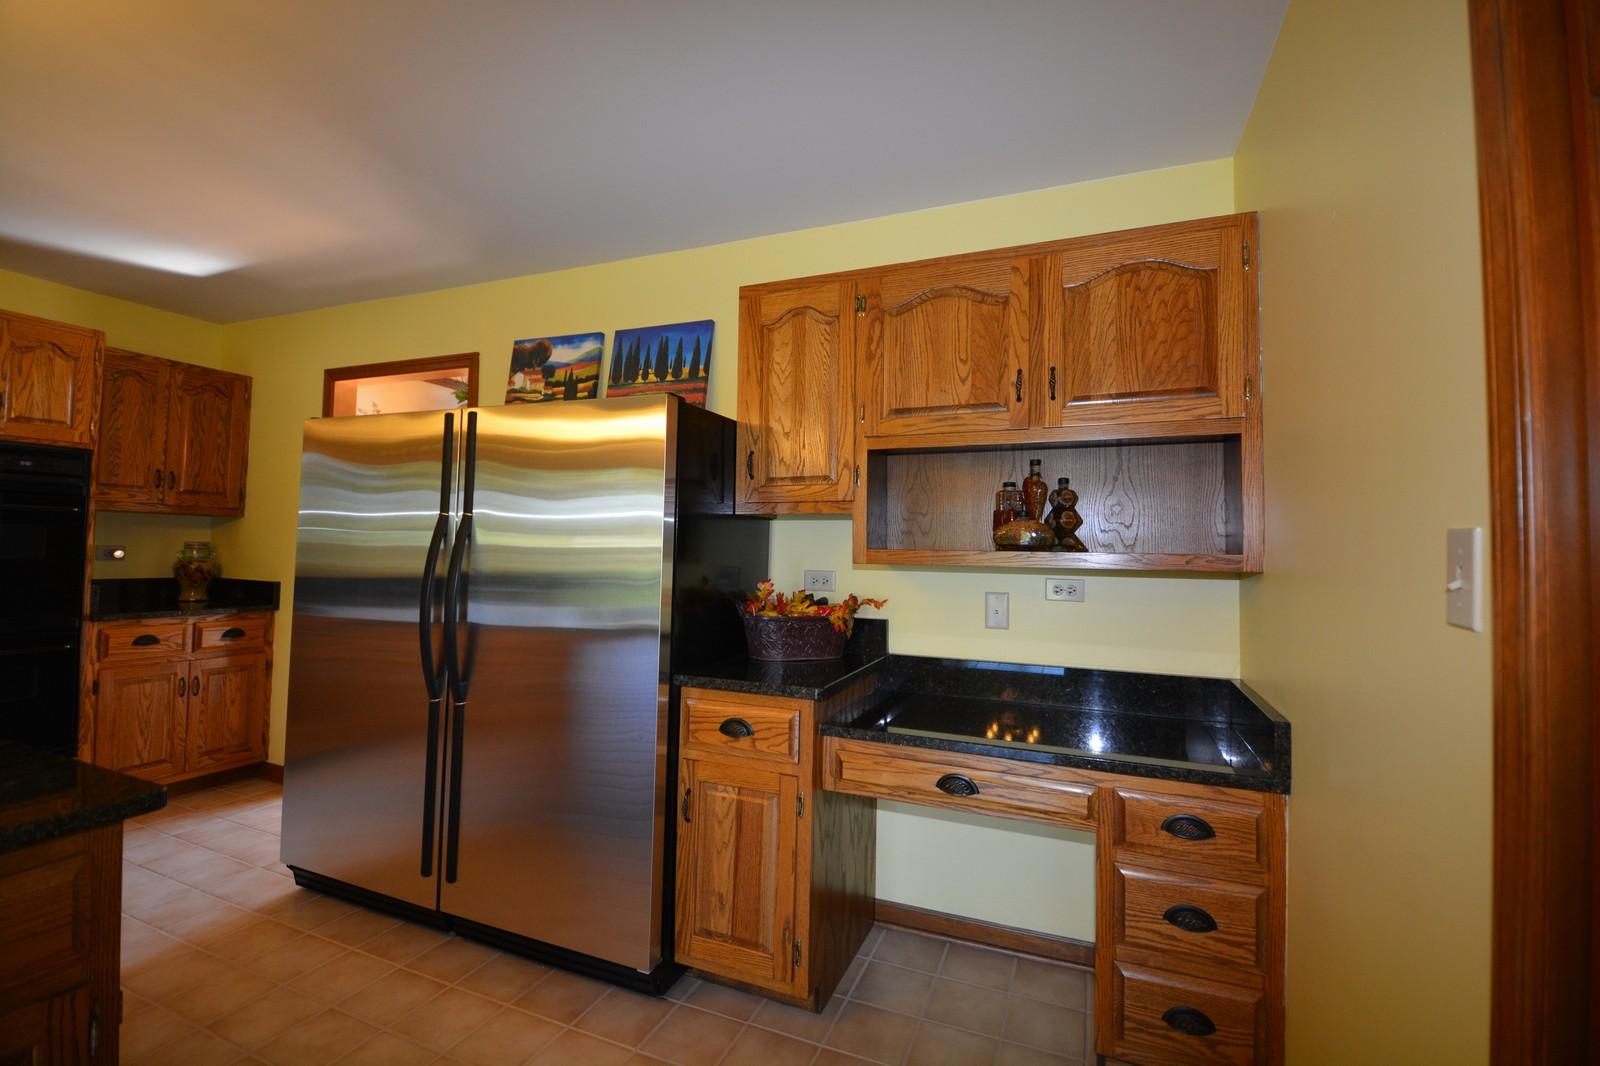 Real Estate Photography - 24060 Royal Worlington Dr, Naperville, IL, 60564 - Kitchen Planning Desk